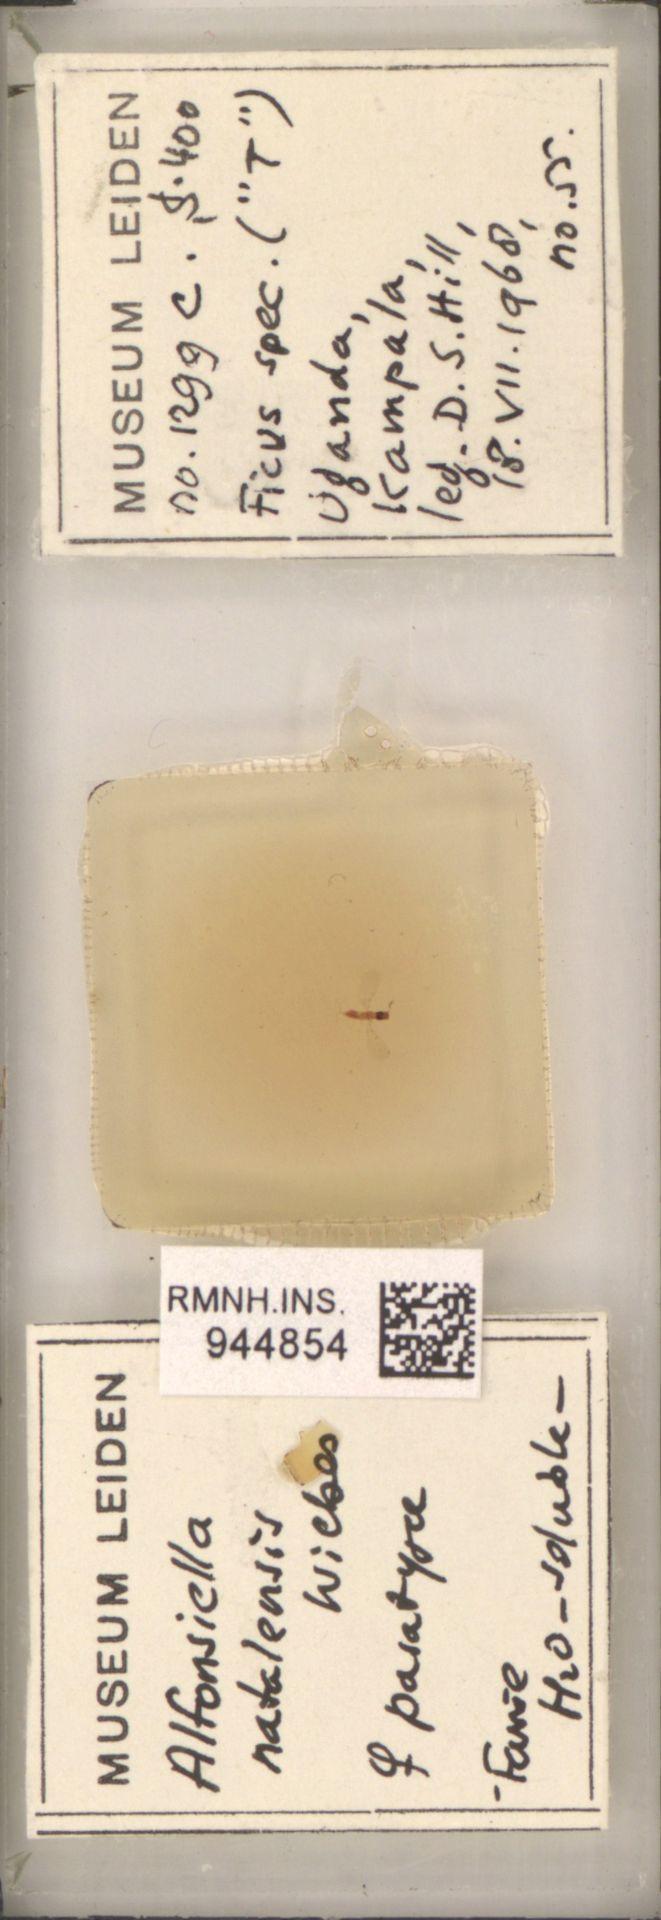 RMNH.INS.944854   Alfonsiella natalensis Wiebes